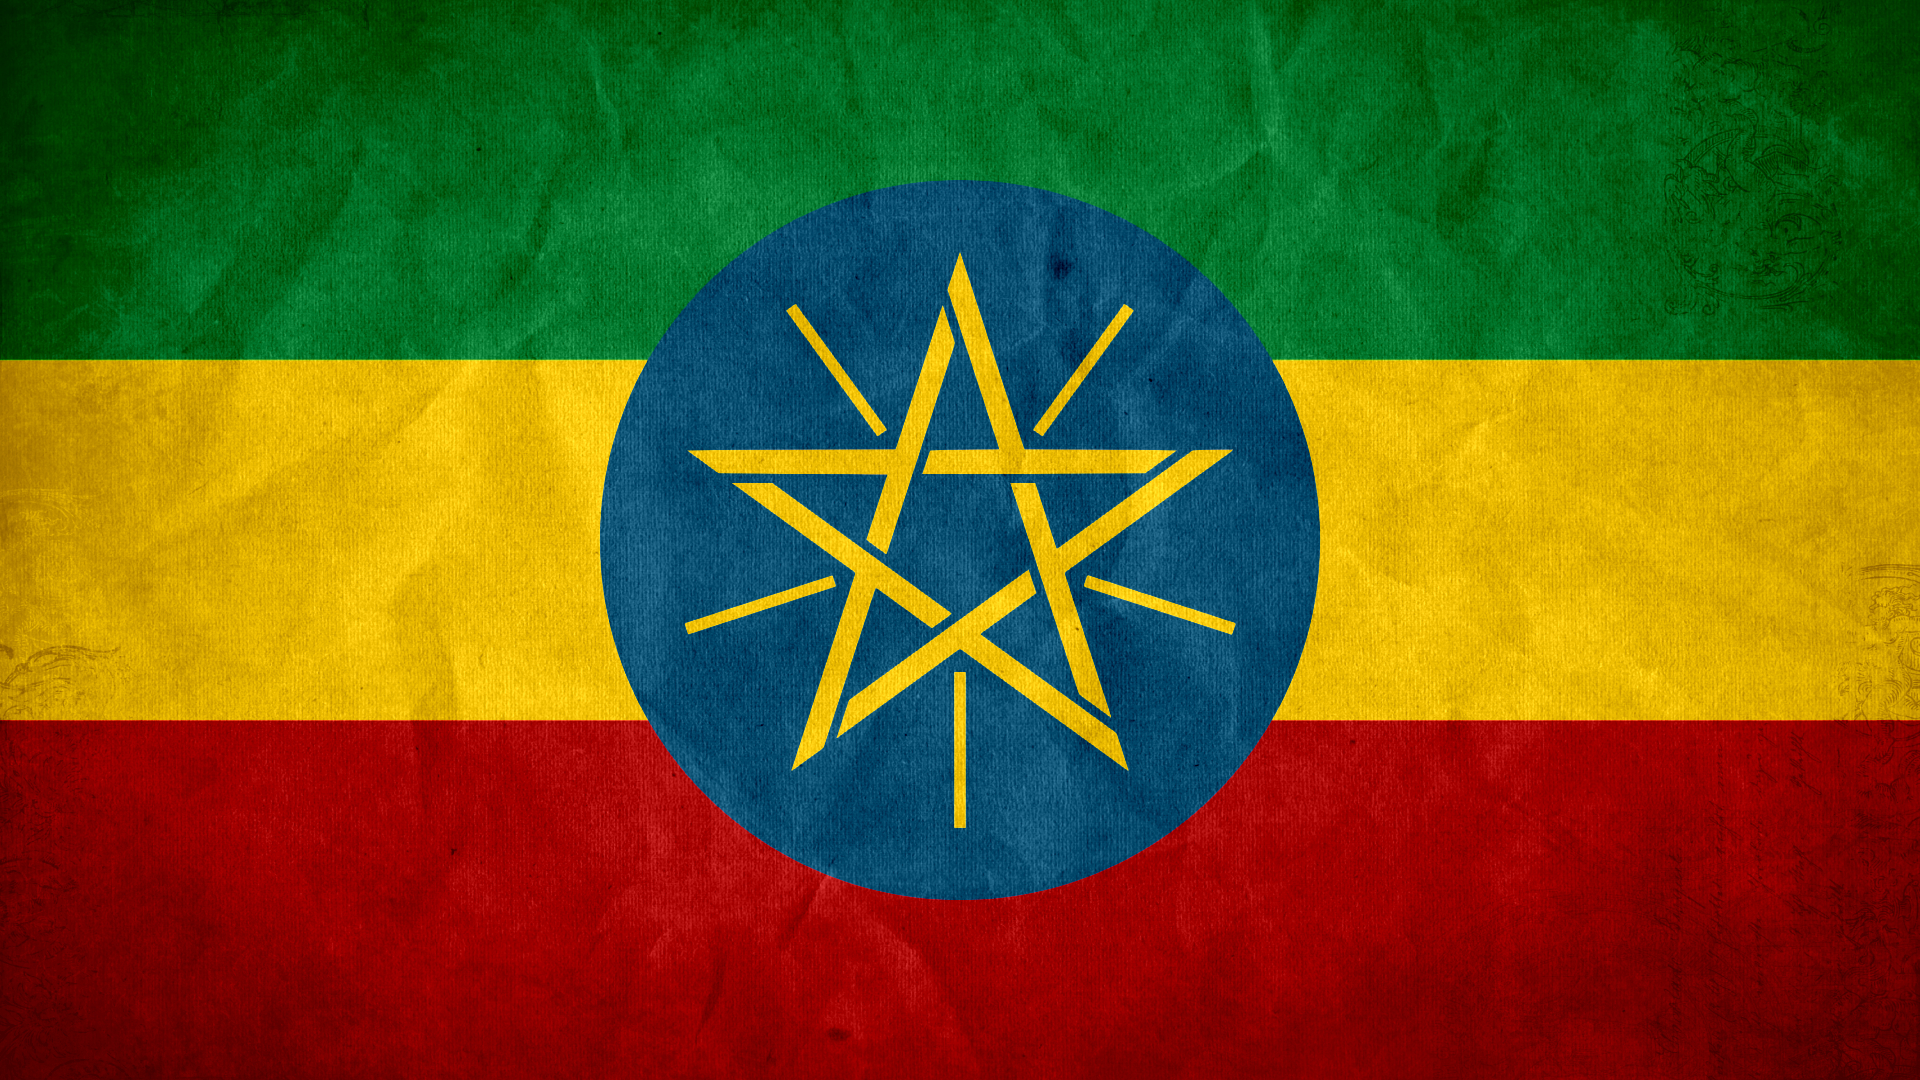 Ethiopia Flag Day hd wallpapers desktop windows 81 Picturenixcom 1920x1080